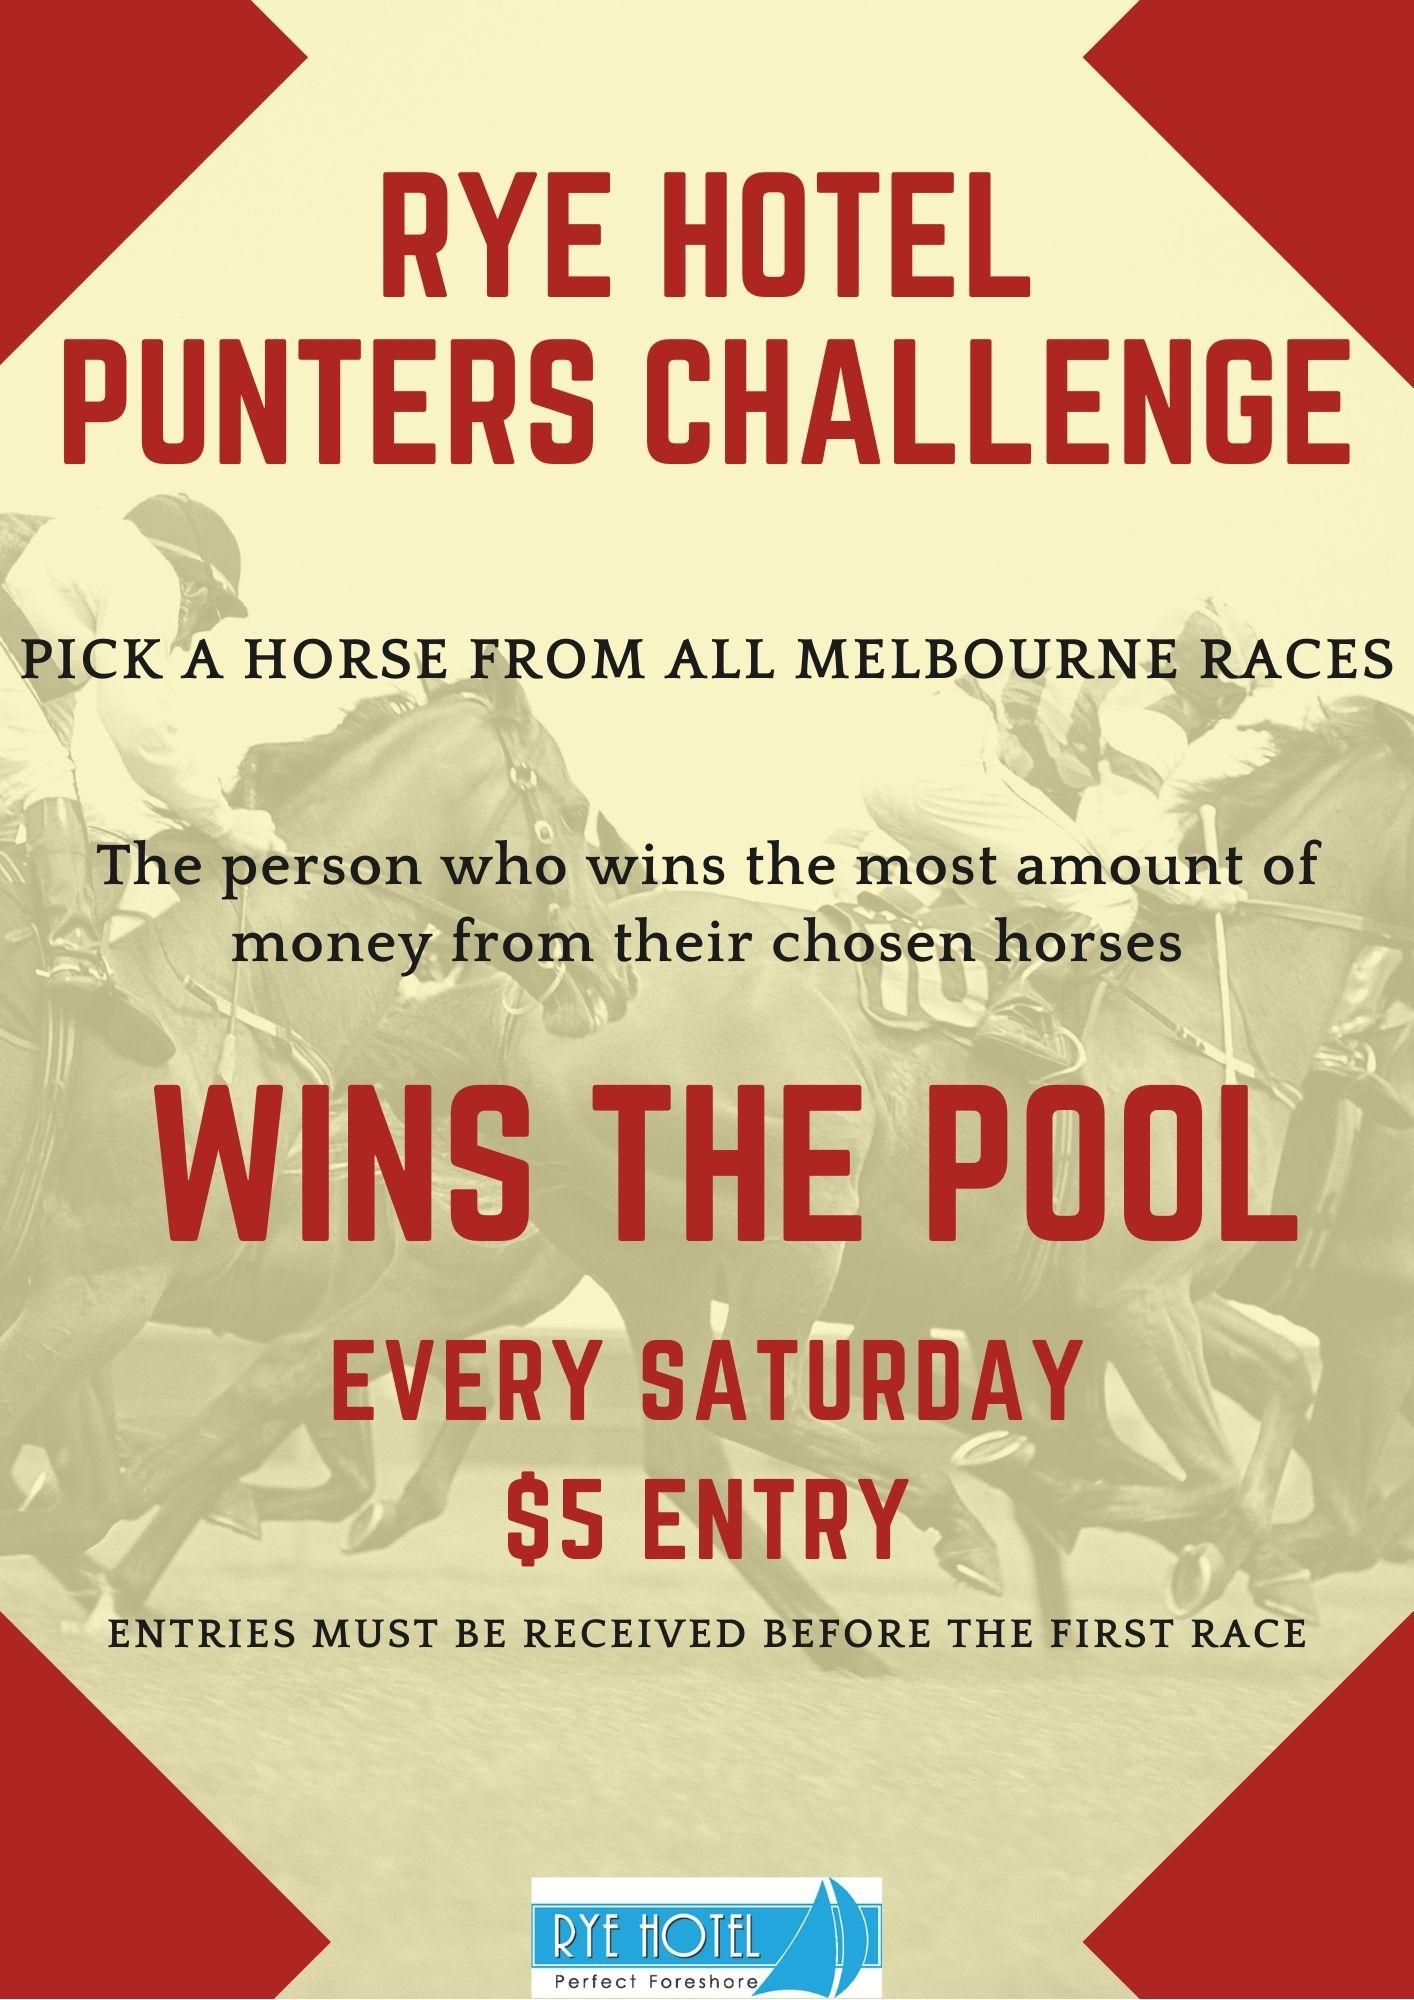 Punters Challenge Poster - Feb 21